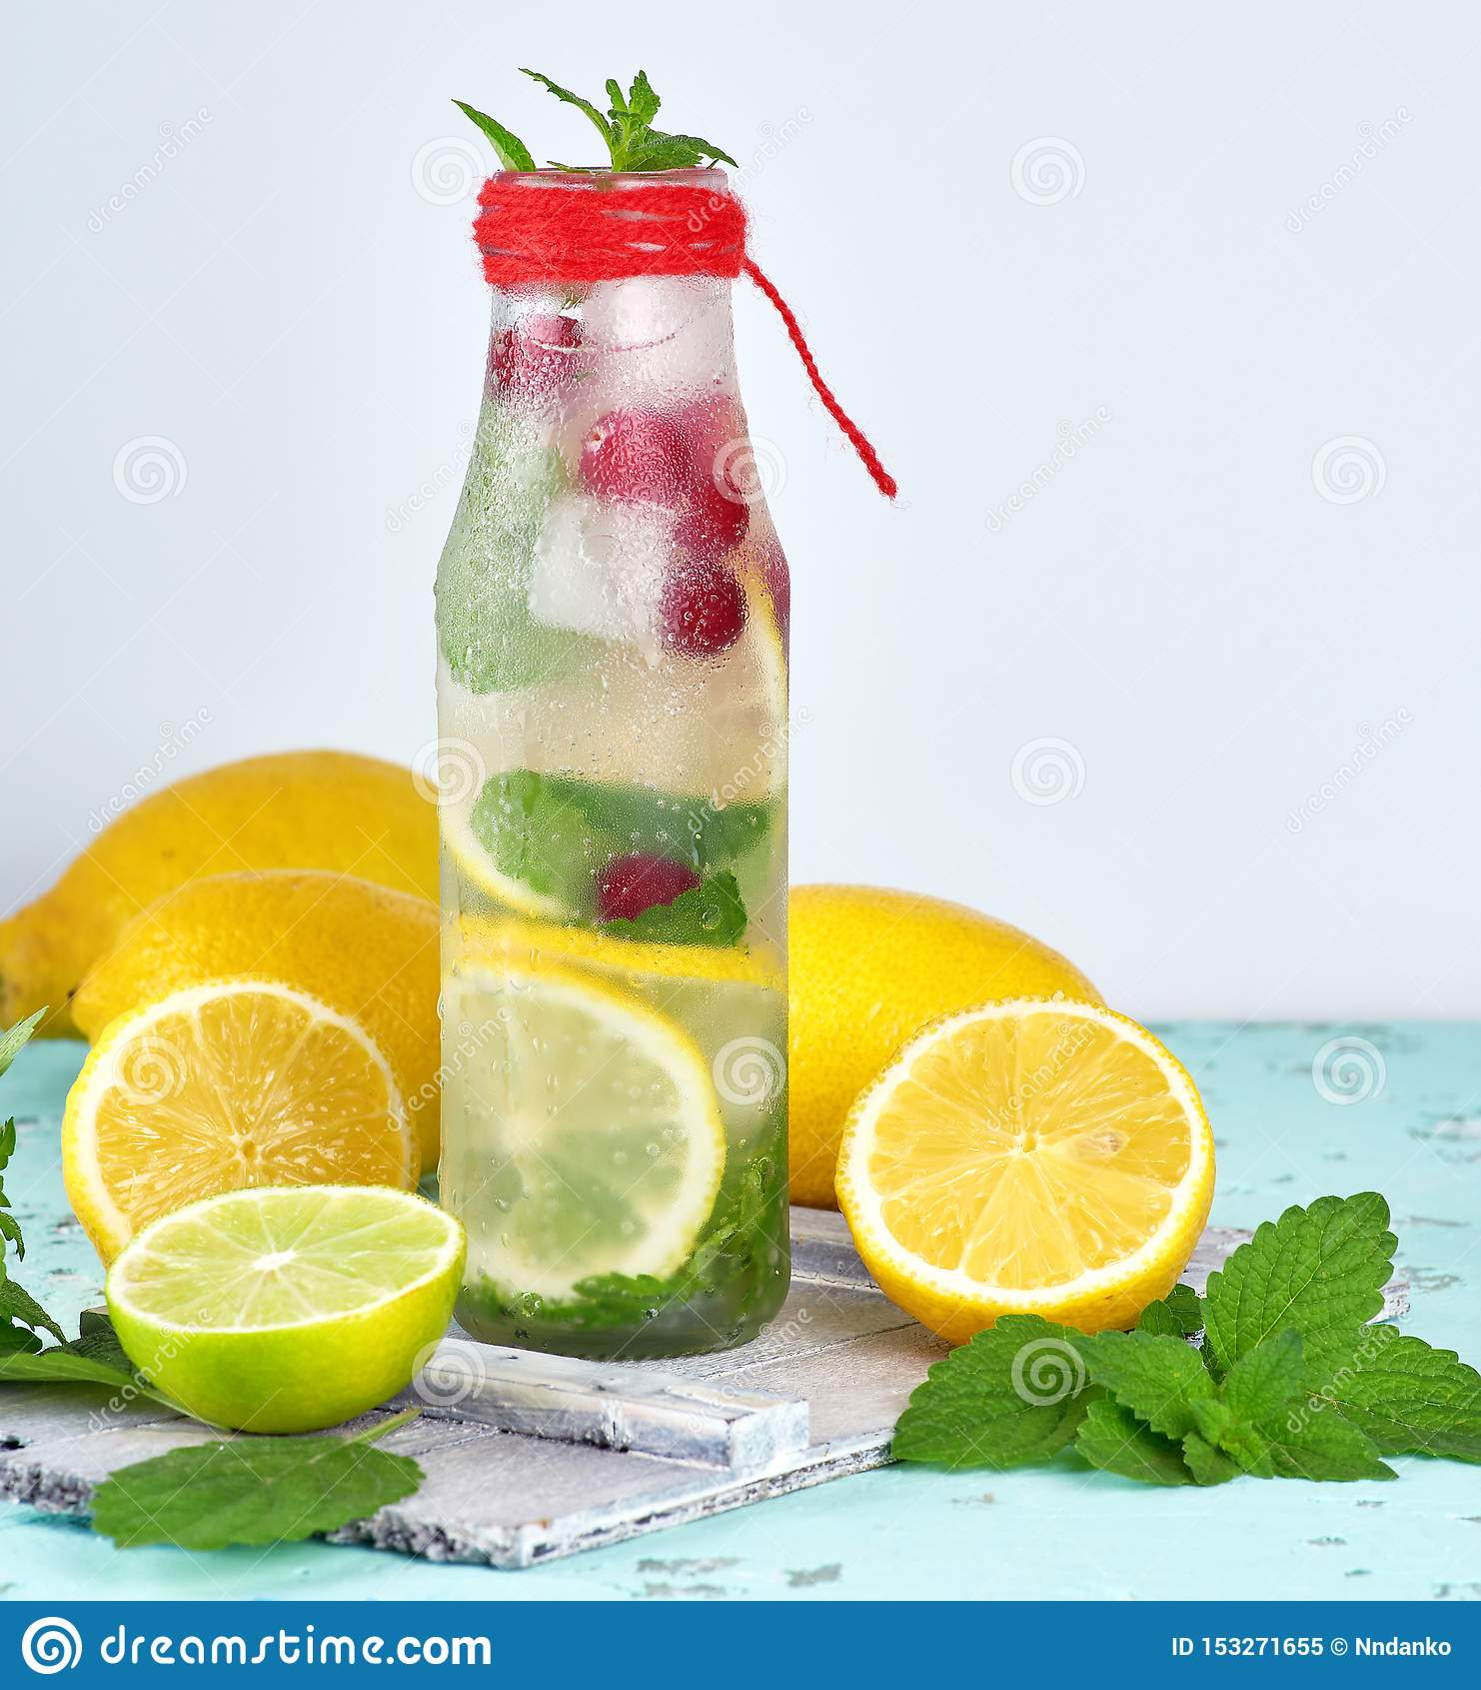 summer refreshing drink lemonade with lemons, cranberry, mint leaves